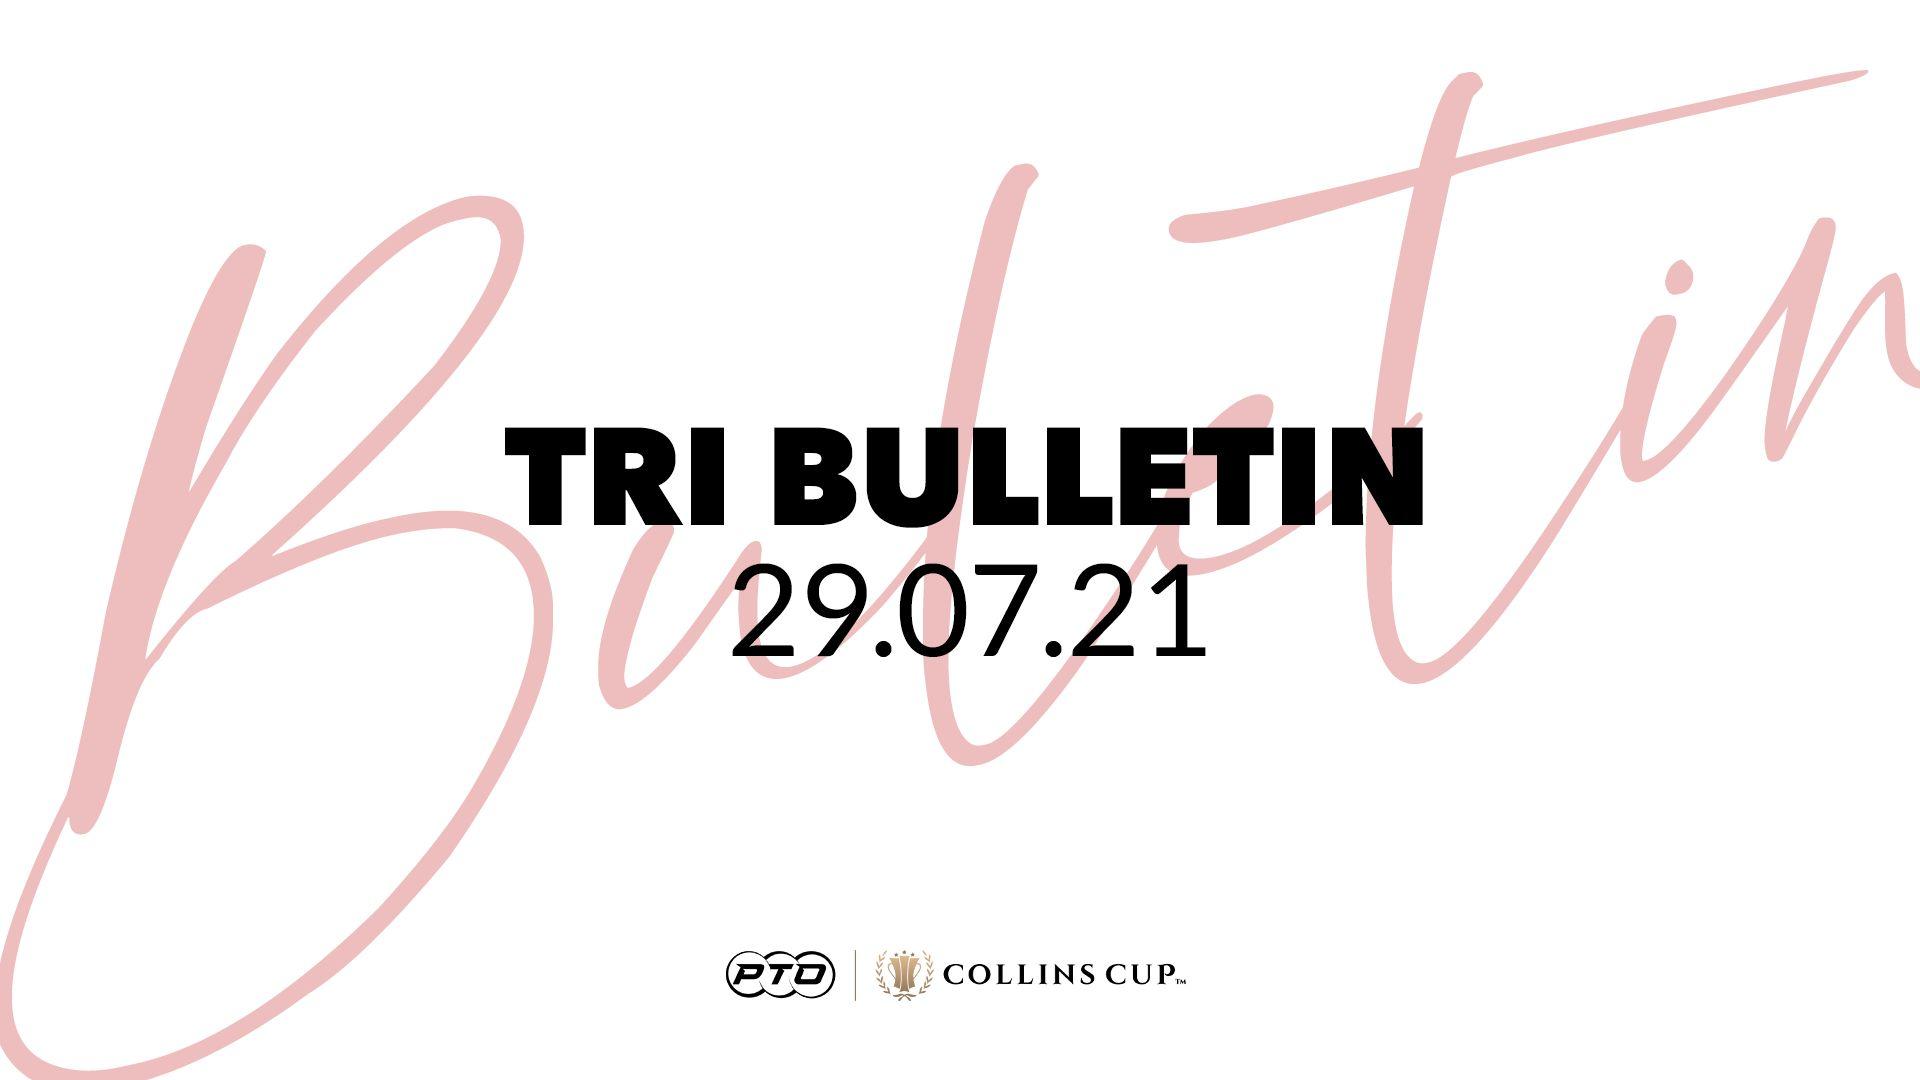 Tri Bulletin 29.07.21